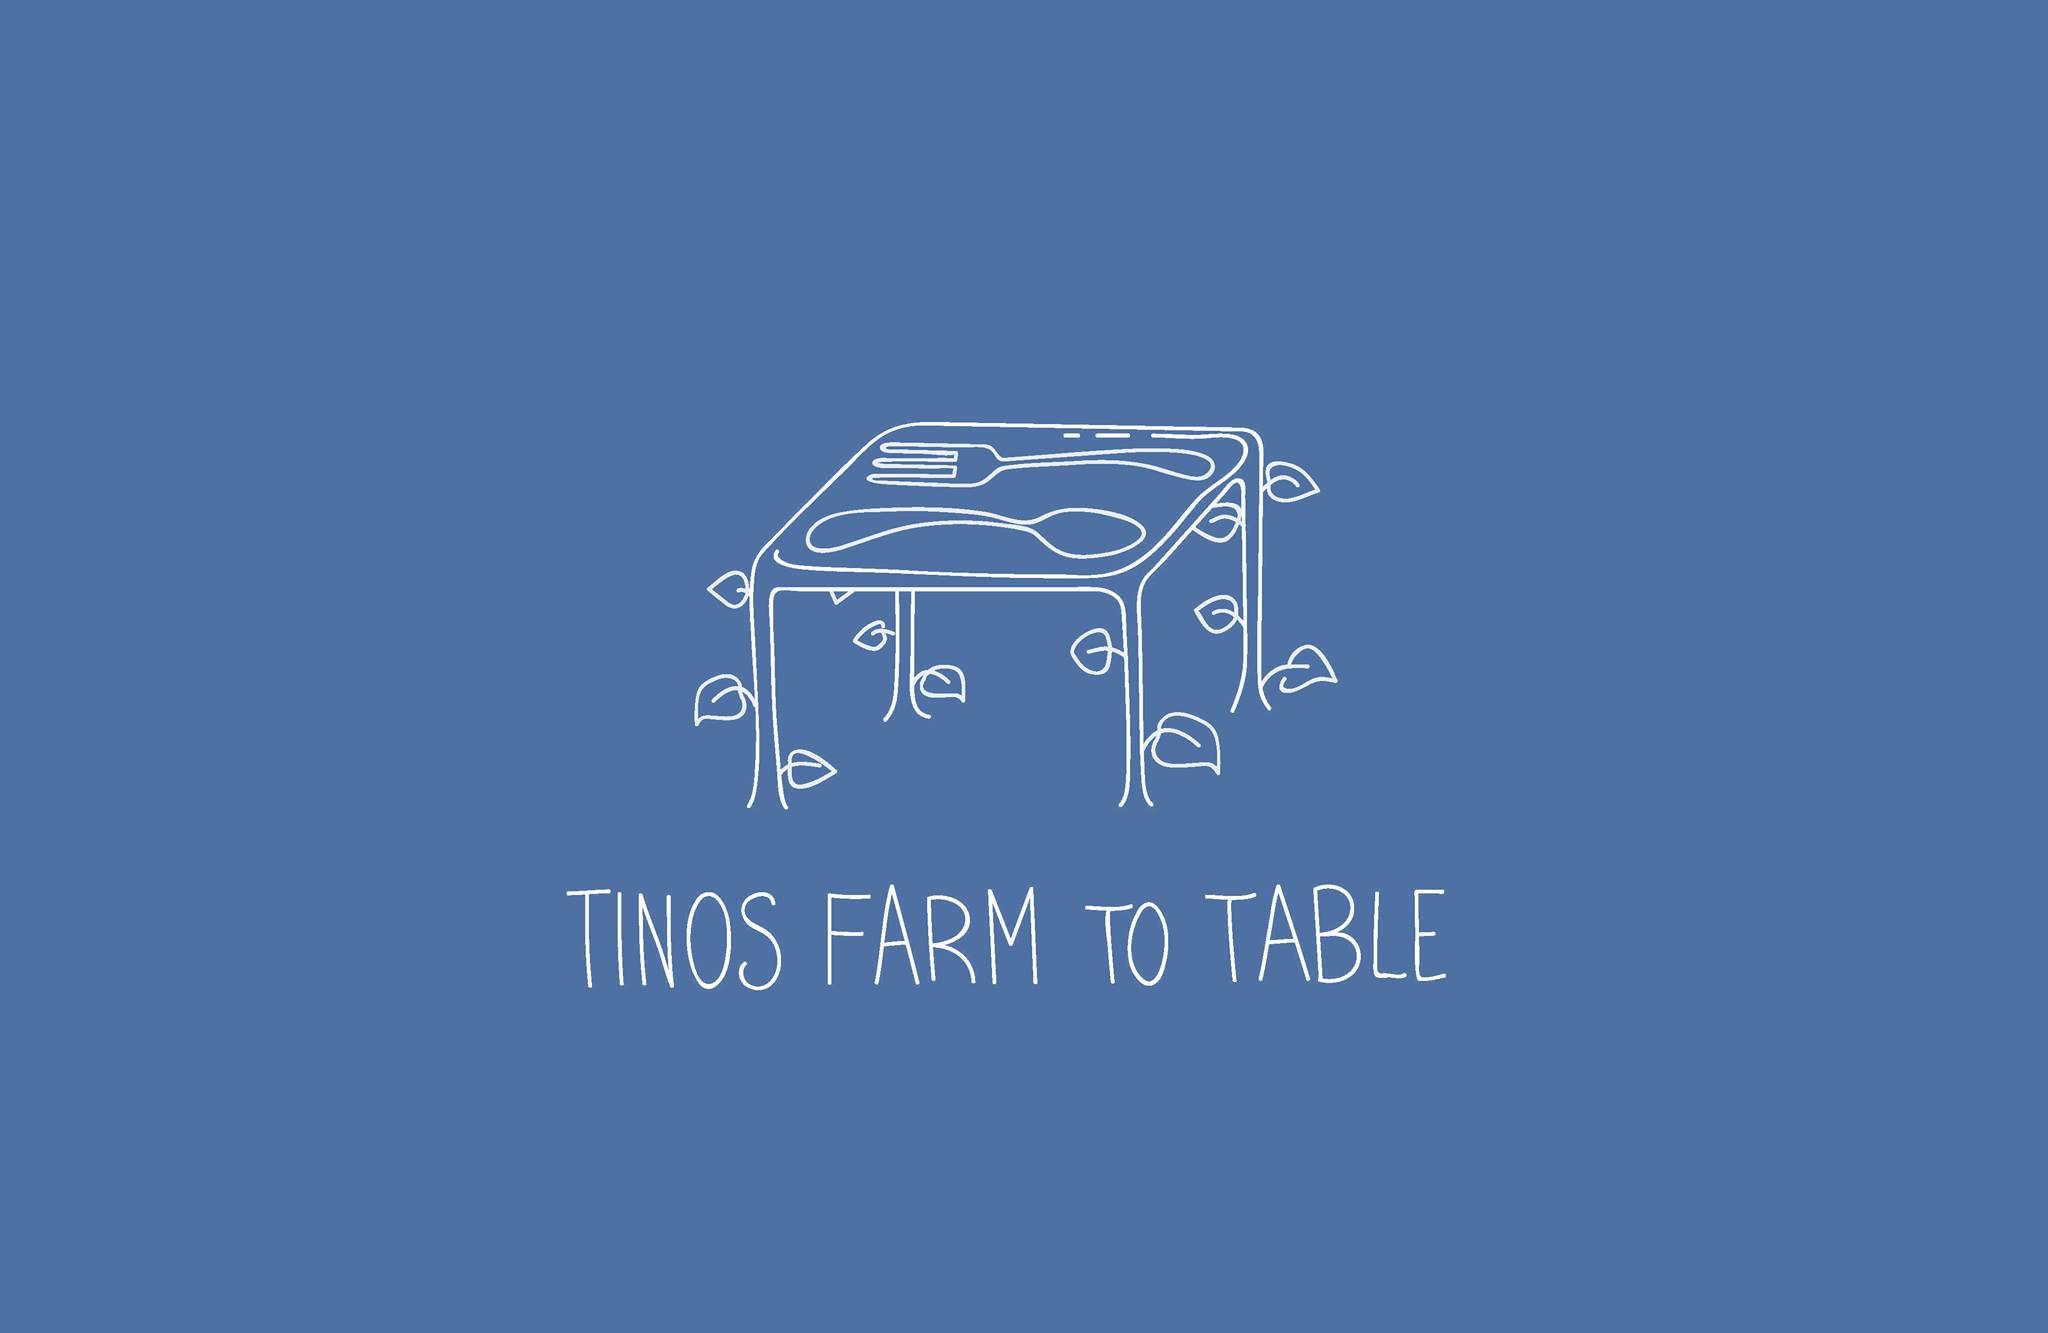 Tinos Farm to Table